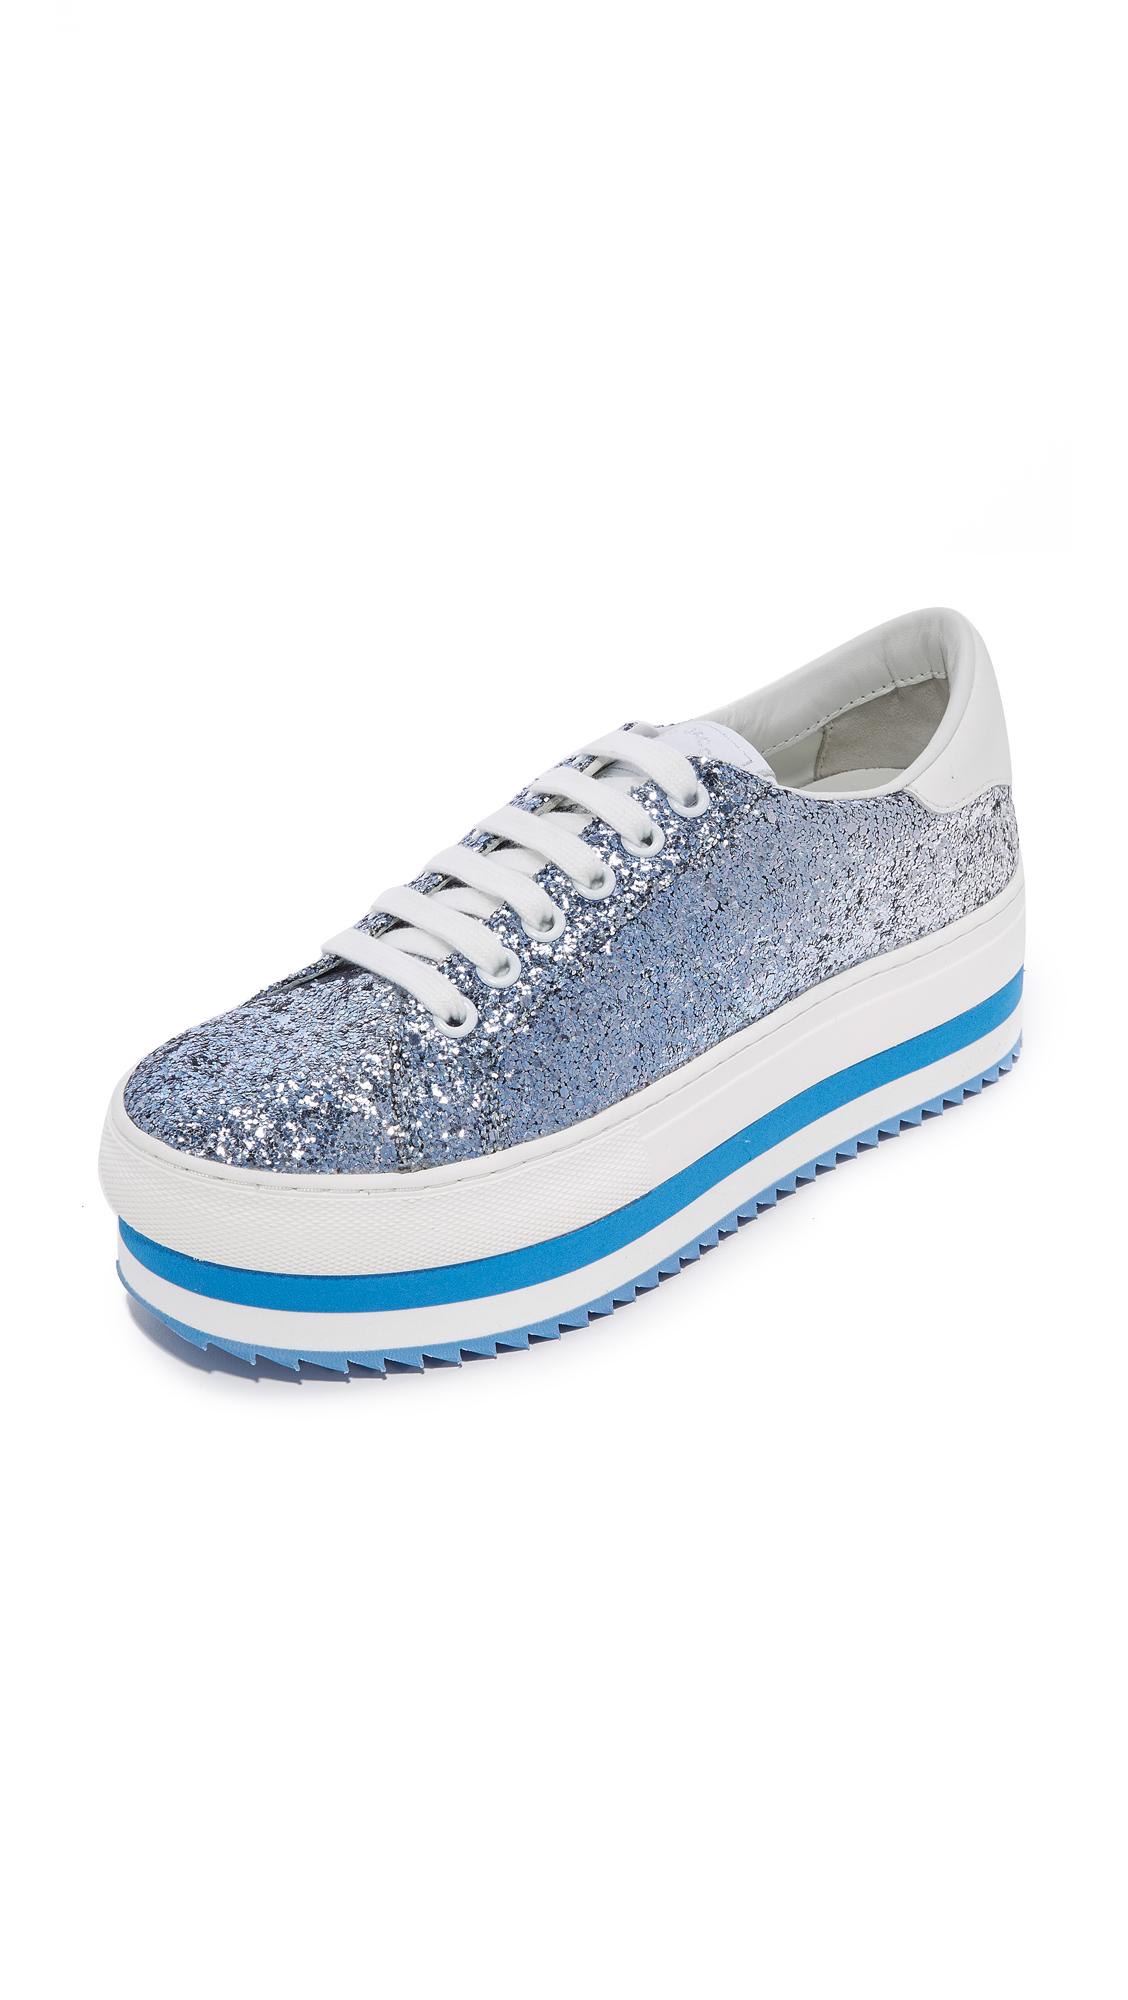 Marc Jacobs Grand Platform Sneakers - Blue Multi